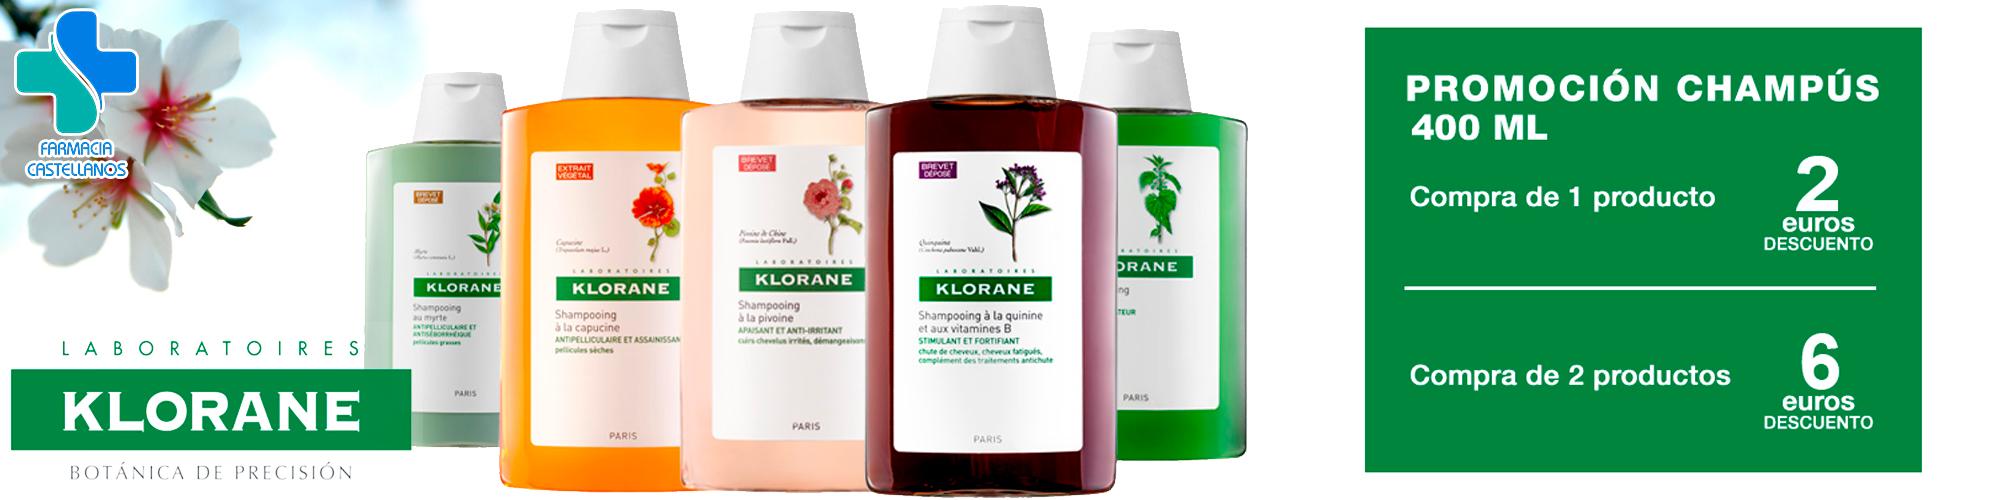 promo-klorane-farmaciabeatrizcastellanos